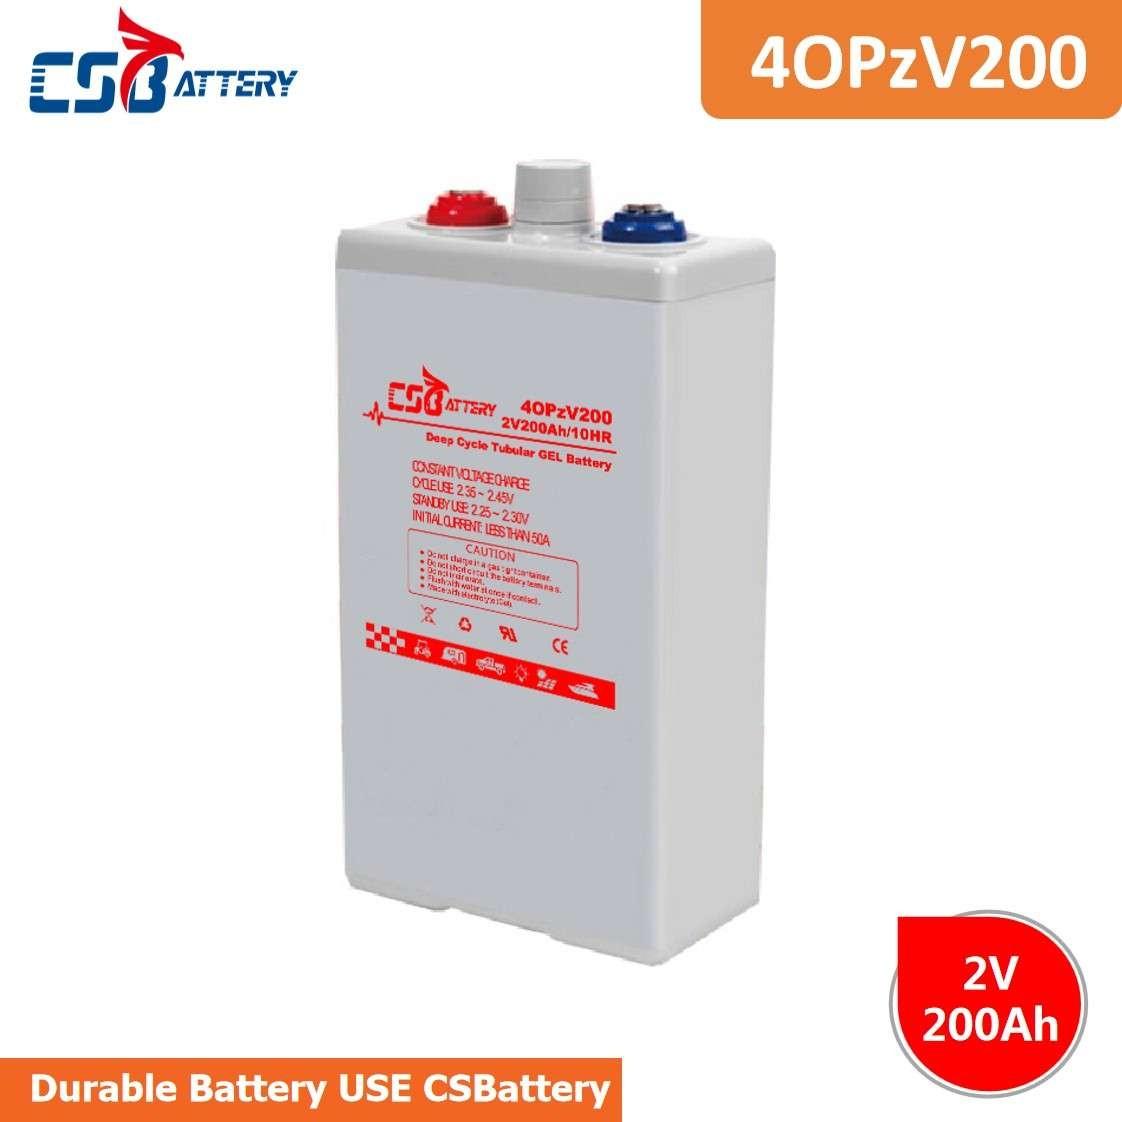 CSBattery 2V200Ah长周期可充电太阳能电池,用于医疗/扫地机/逆变器/电动工具/草坪和灌溉系统